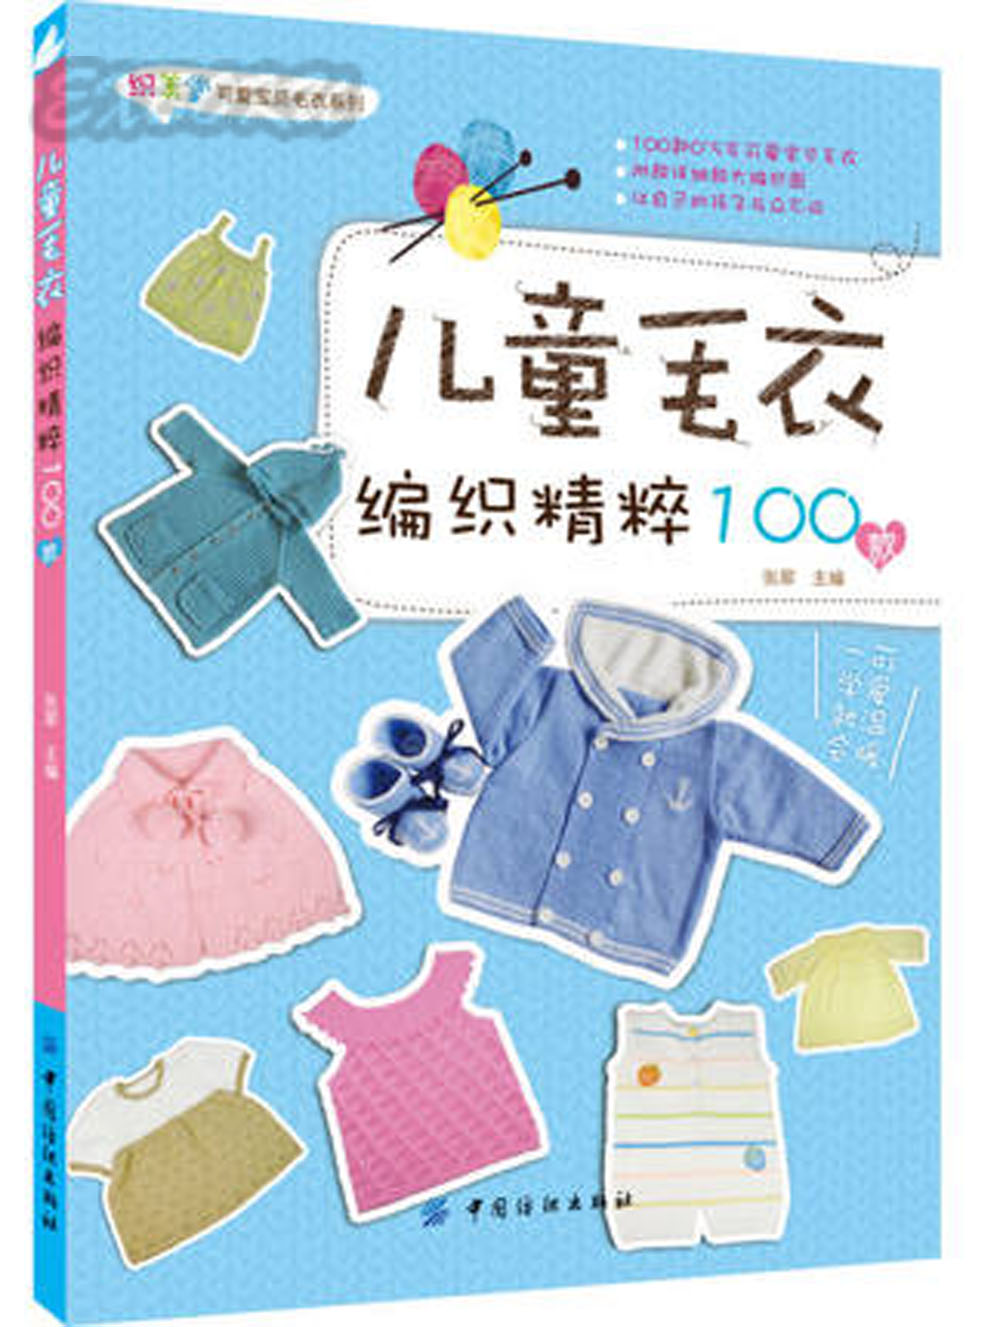 100 Children Sweater Weaving Essence / Chinese Knitting Skills Textbook For Kids Child Babys